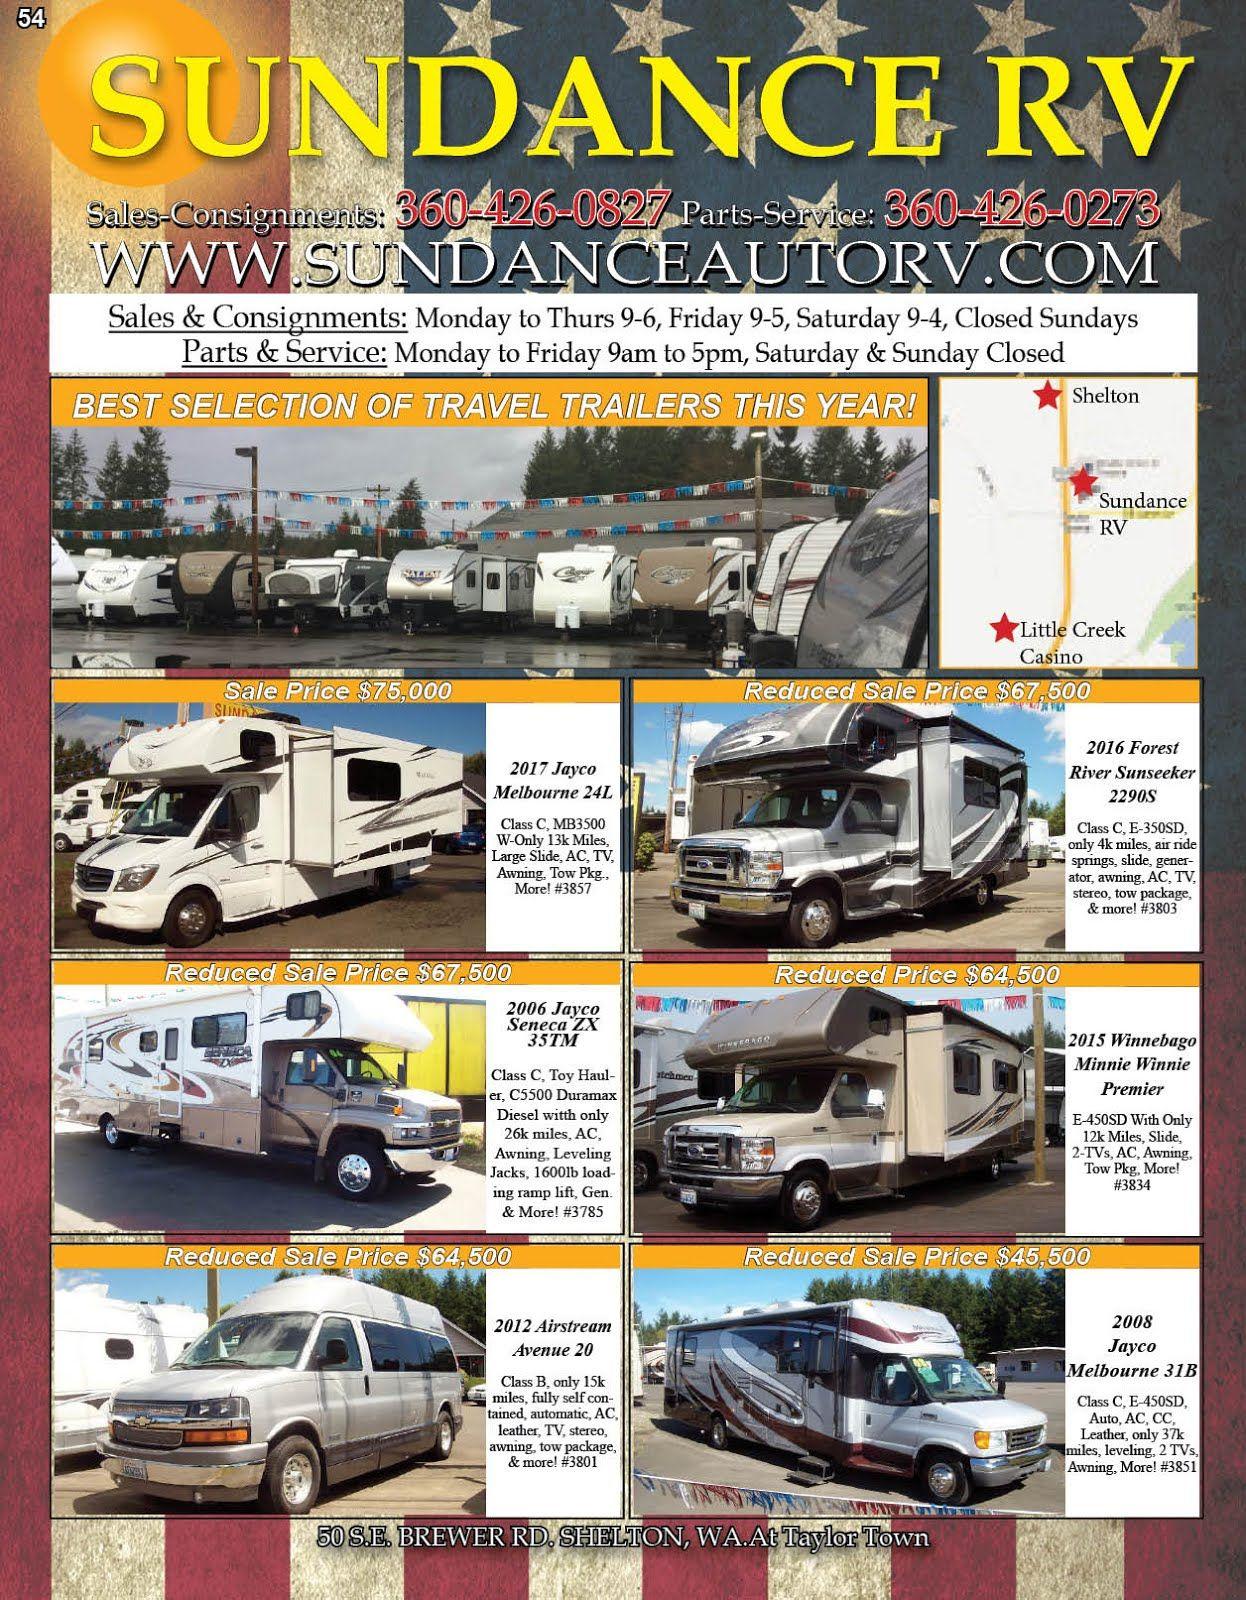 Sundance Auto Rv Center Sales Service Parts Consignments Check Out This Weeks Ad Www Sundanceautorv Com Sundance Travel Trailer Rv